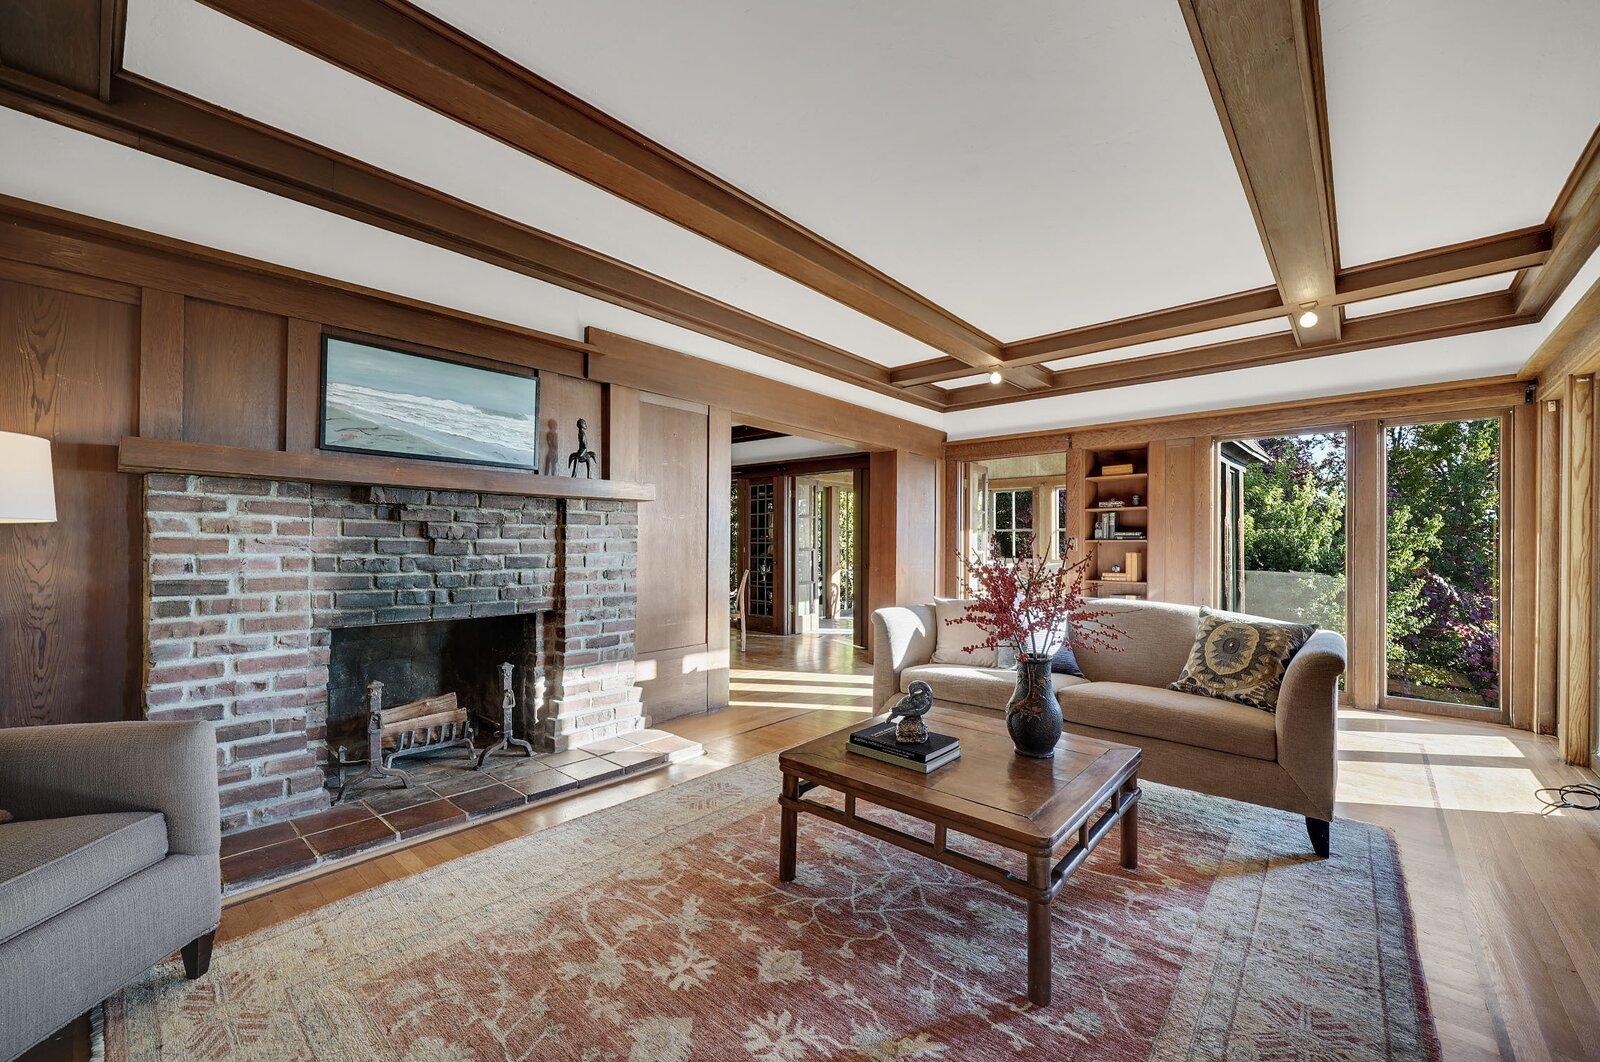 Ericsson-Bray House living room